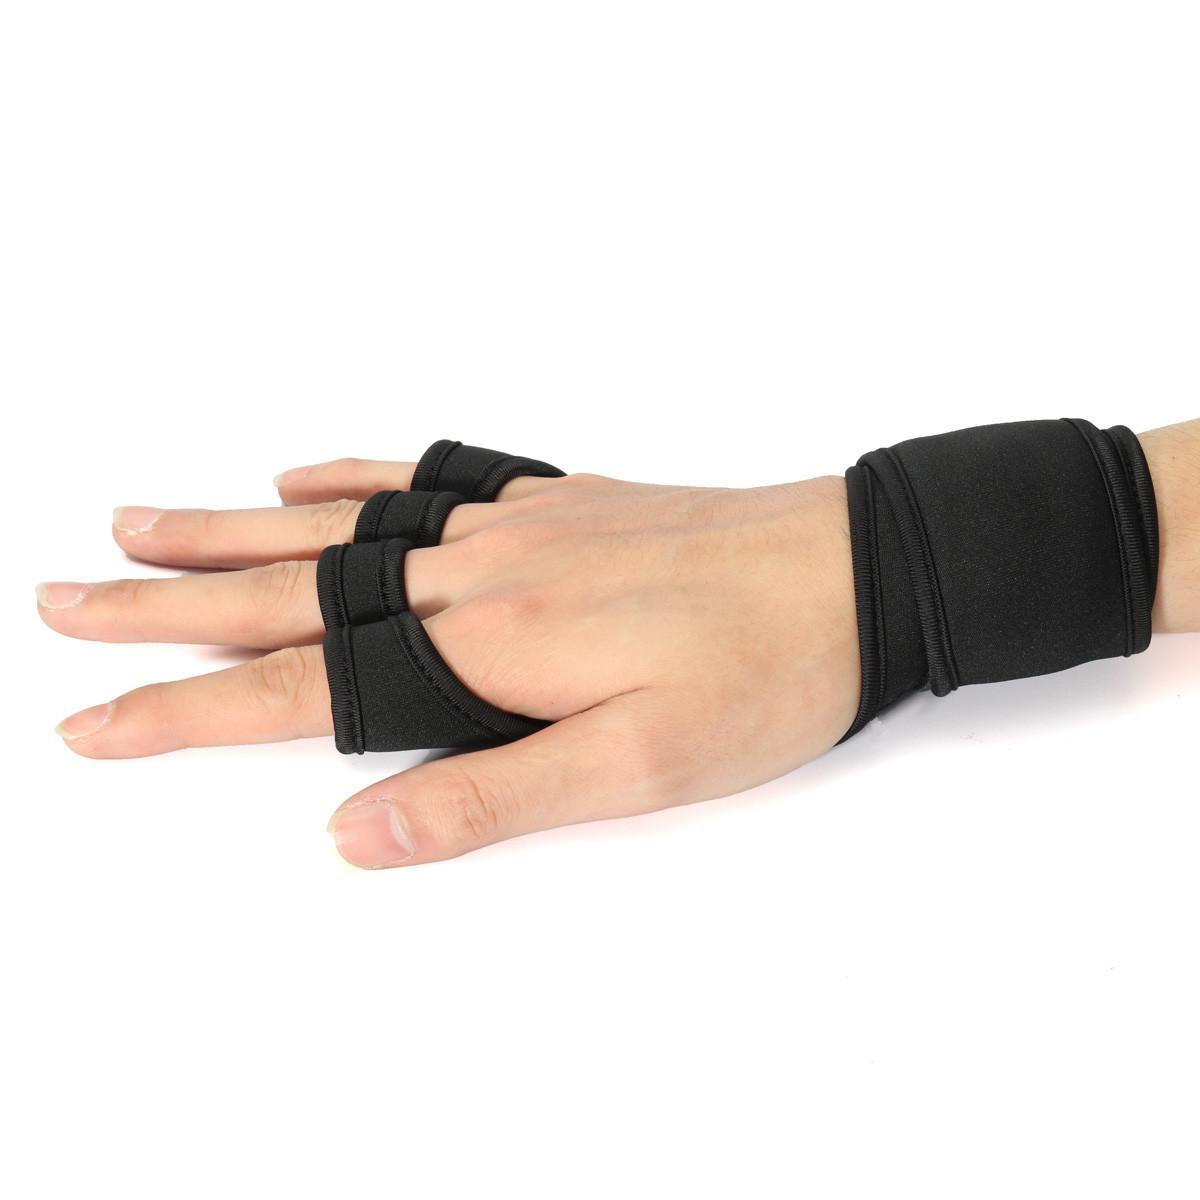 Hand Wrap Gloves Fitness Weight Lifting Gloves Dumbbell Wrist Half Finger Hand